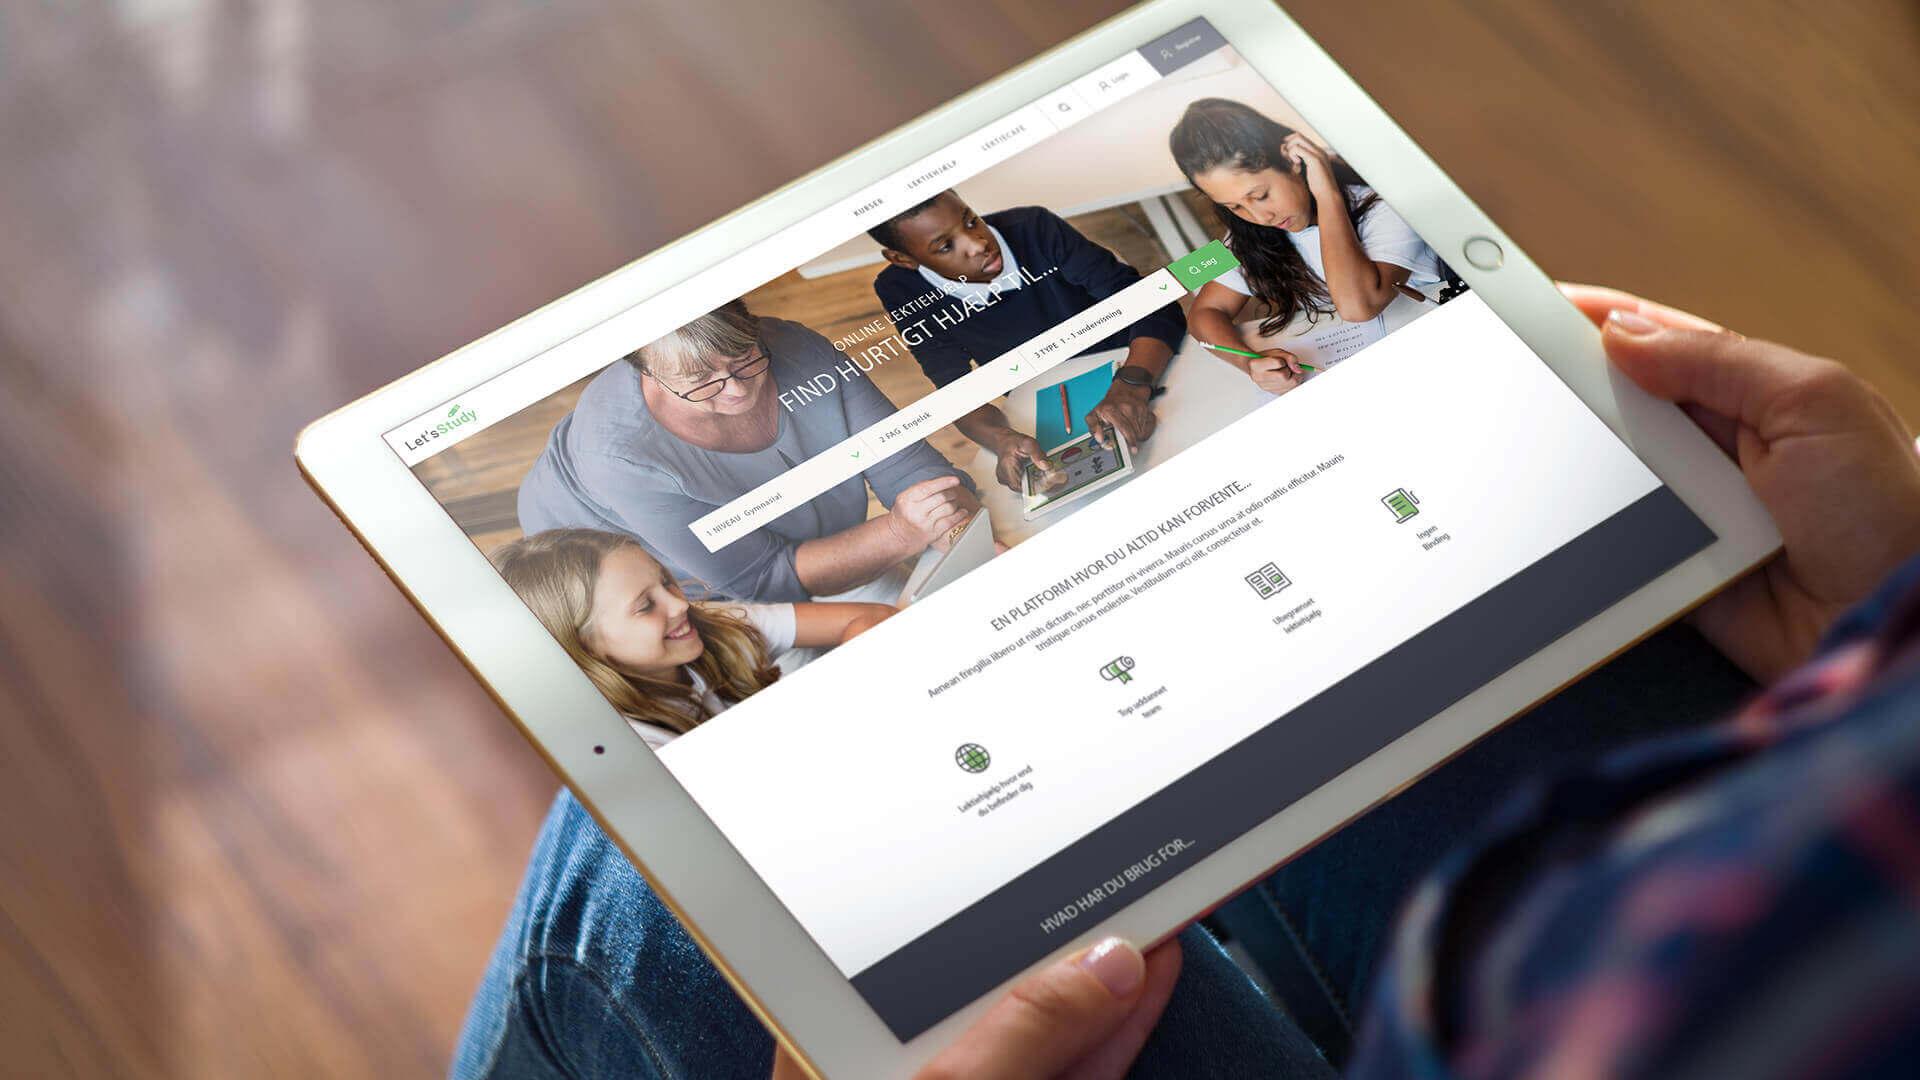 Letsstudy præsentation på iPad